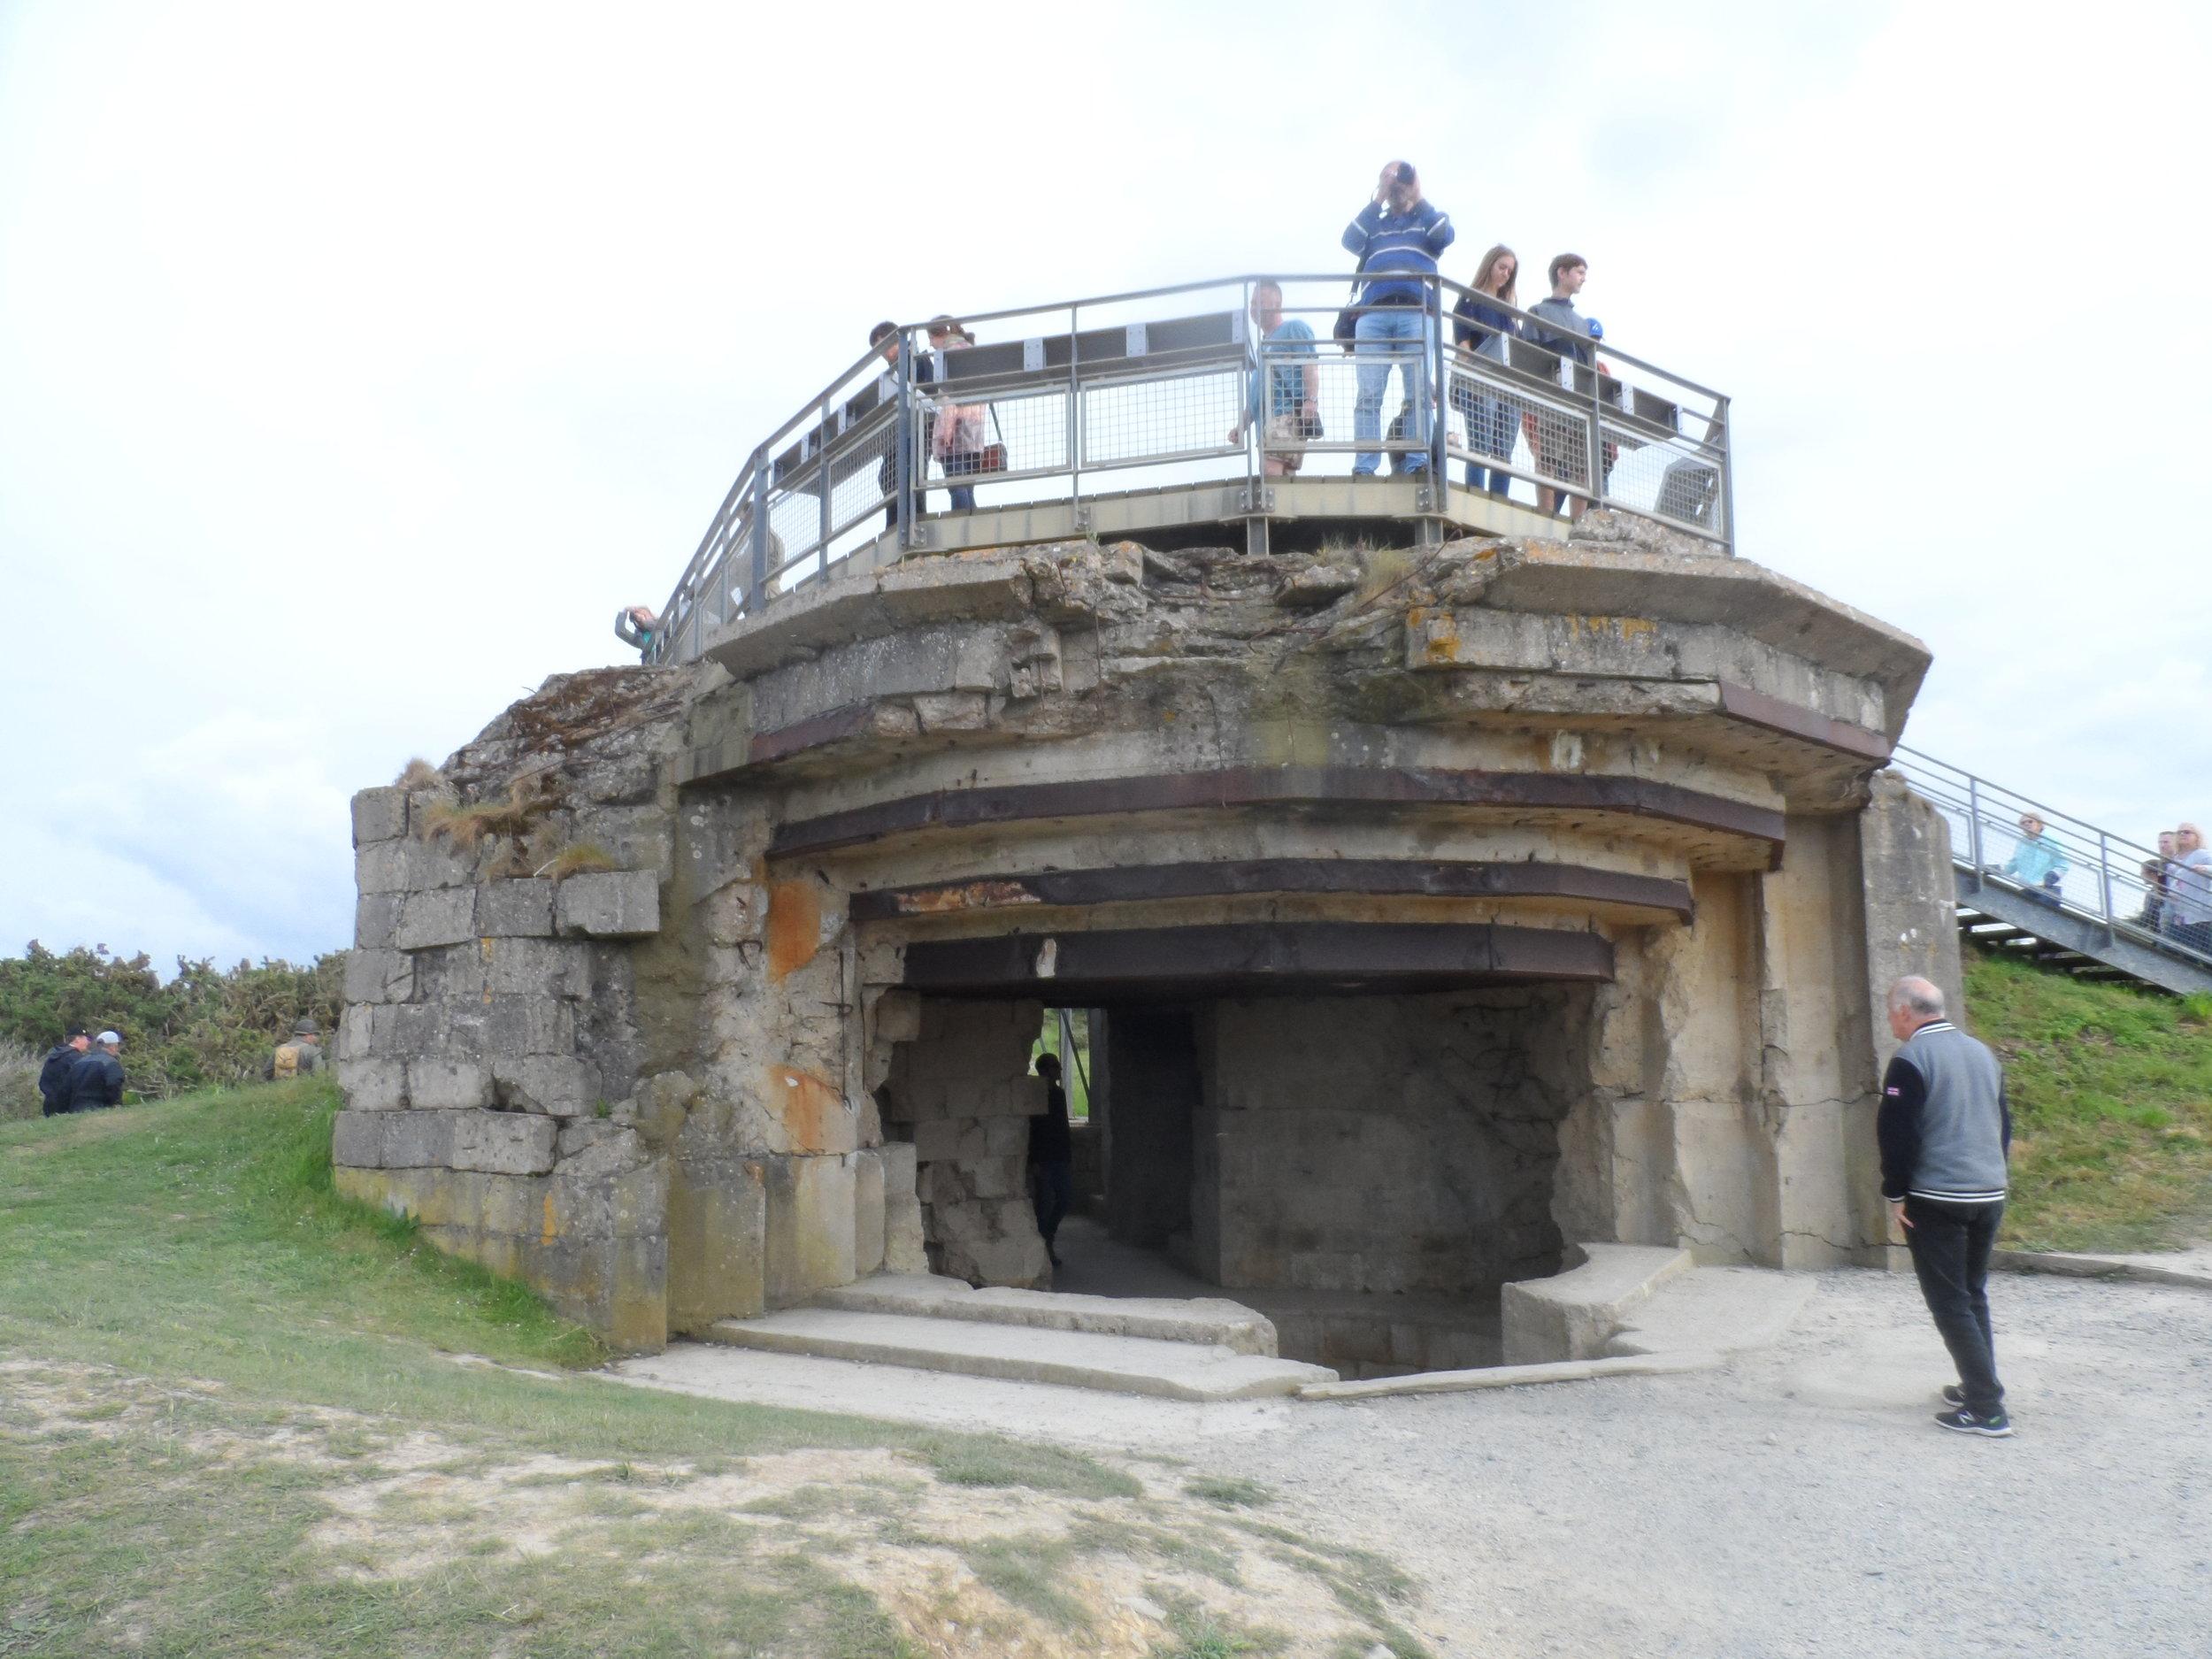 Pointe du Hoc Gun Bunker 2019